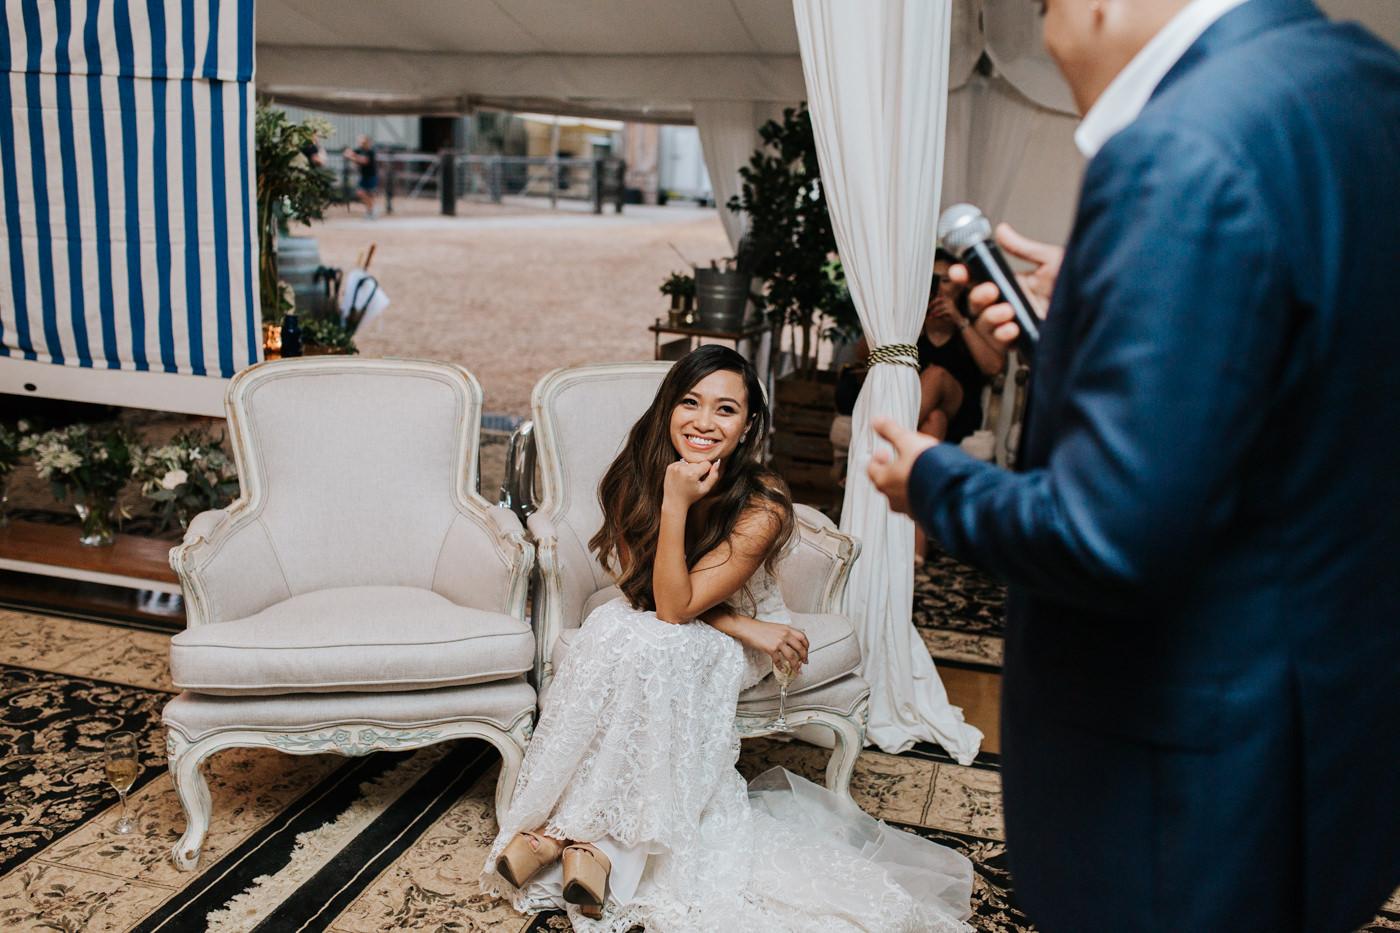 Nick & Vanezza - Fernbank Farm Wedding - Samantha Heather Photography-154.jpg